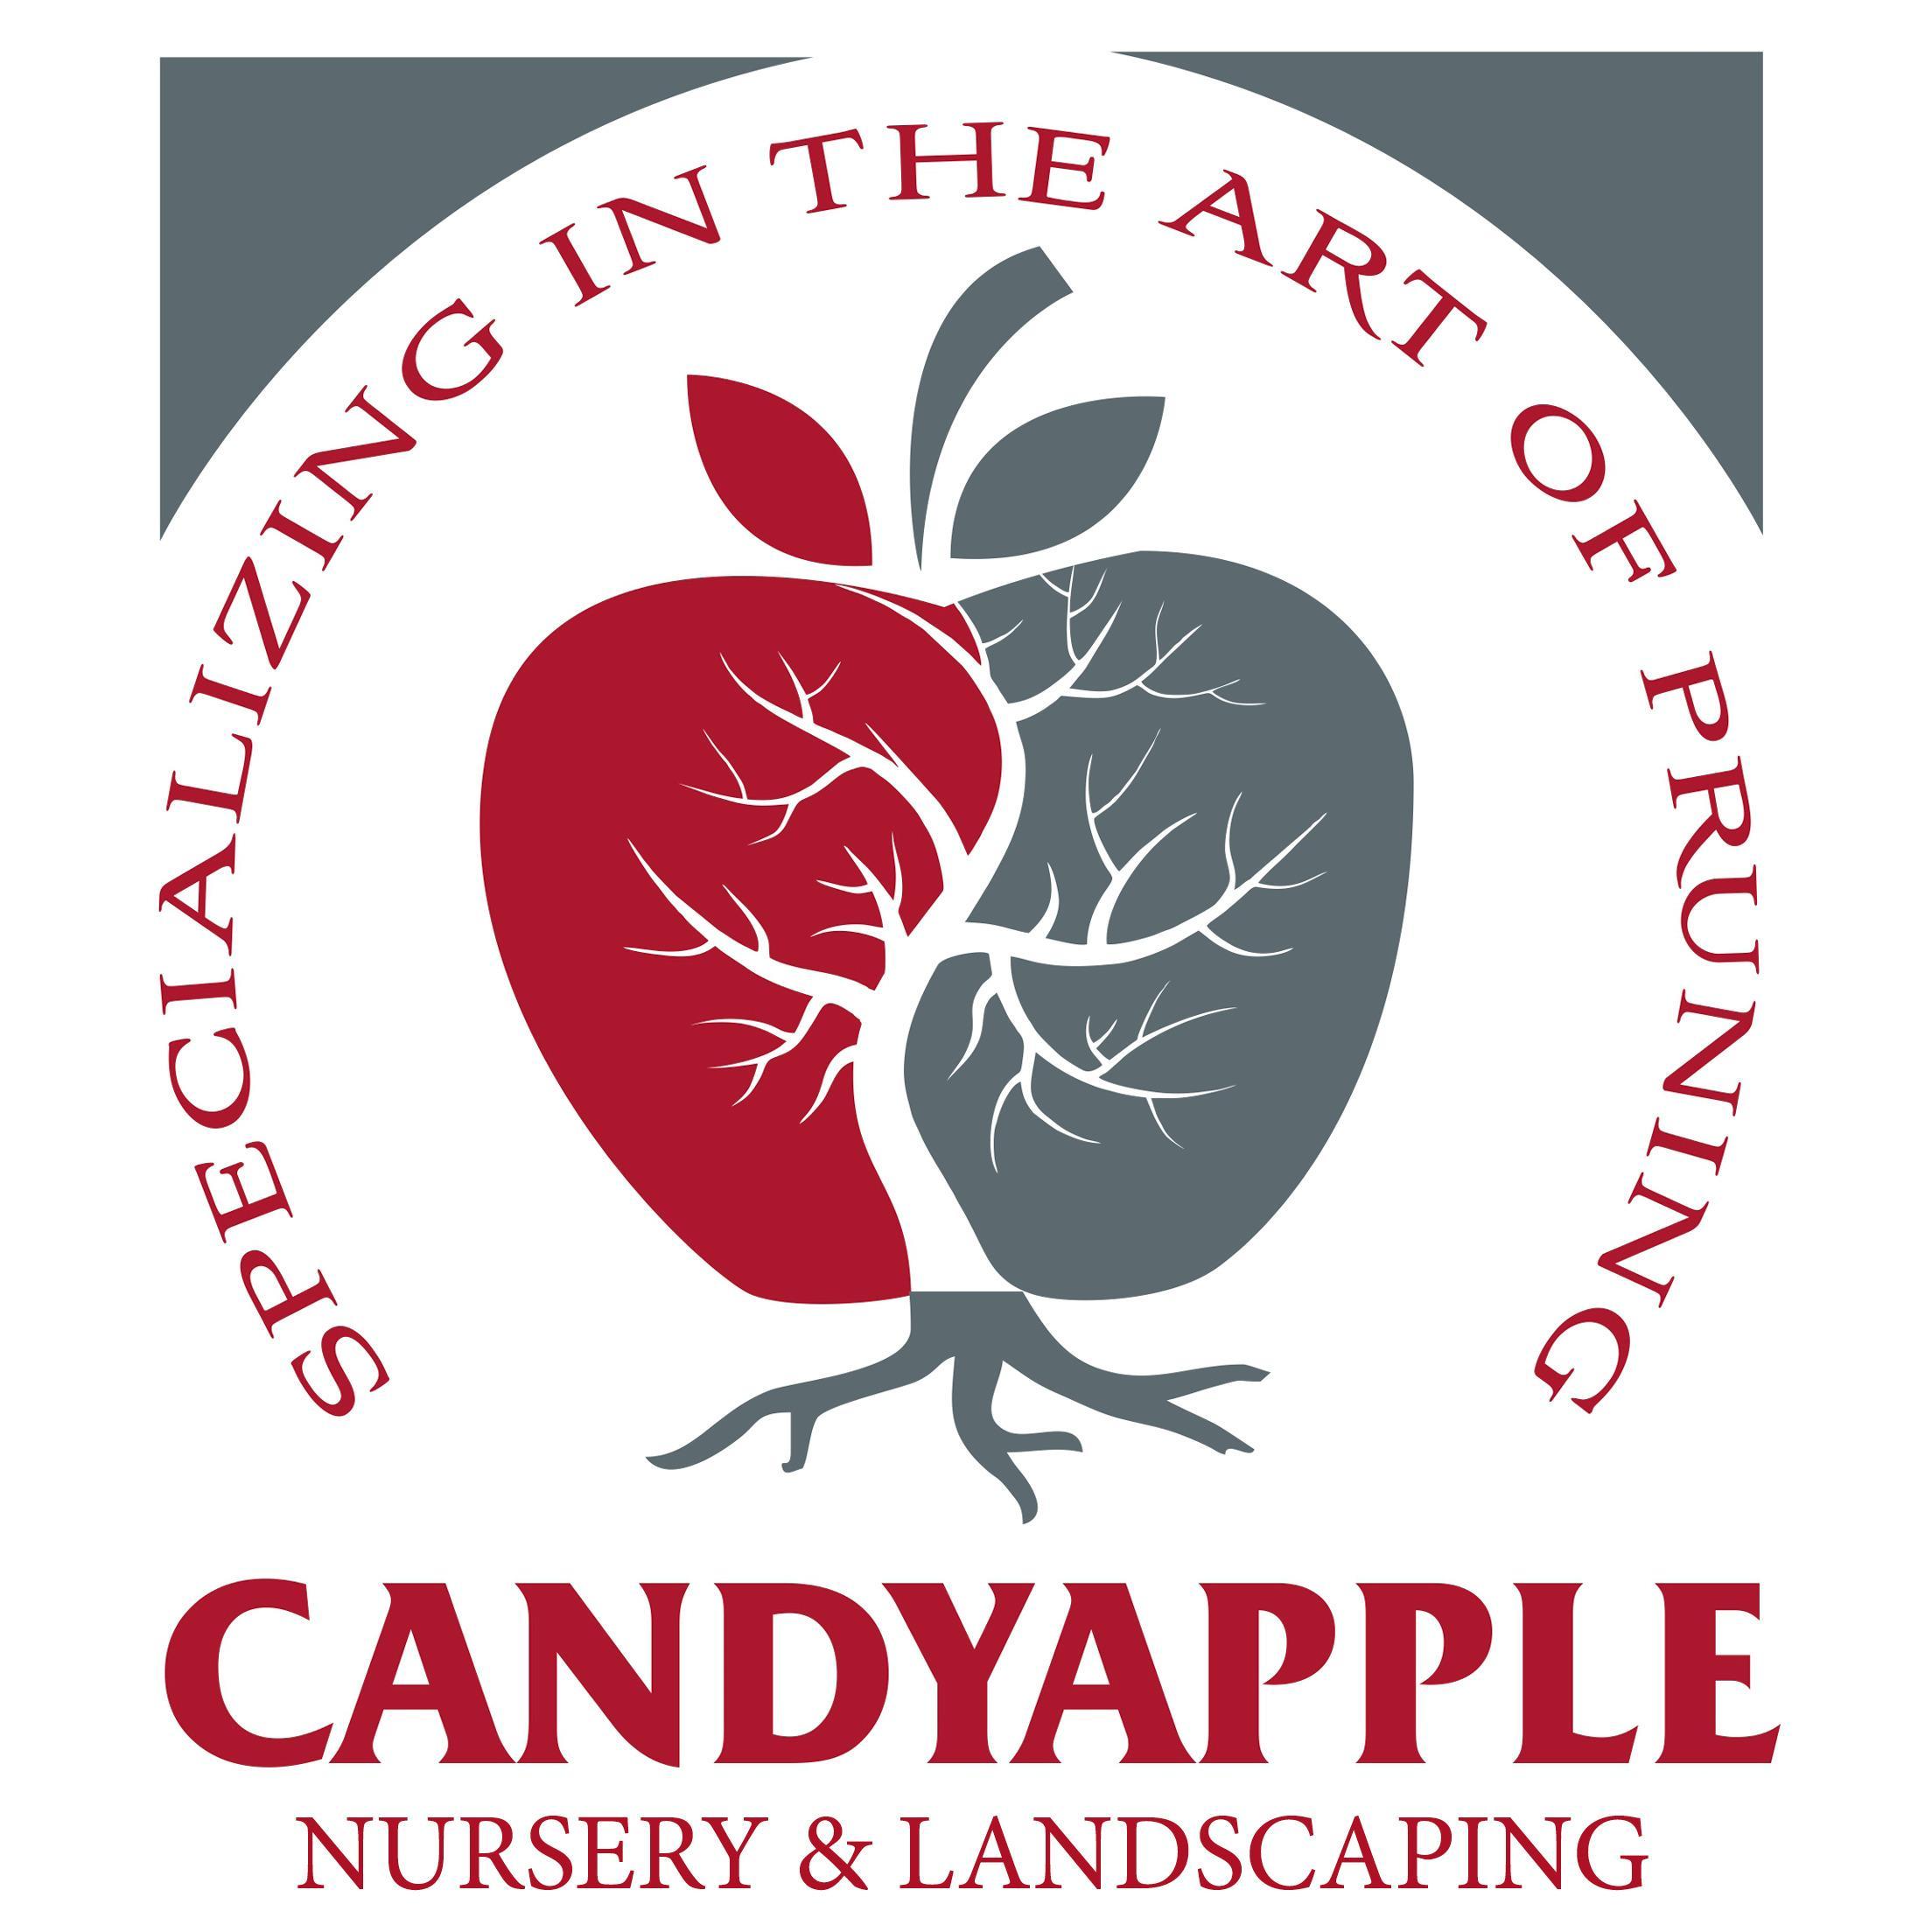 Candyapple Nursery & Landscaping